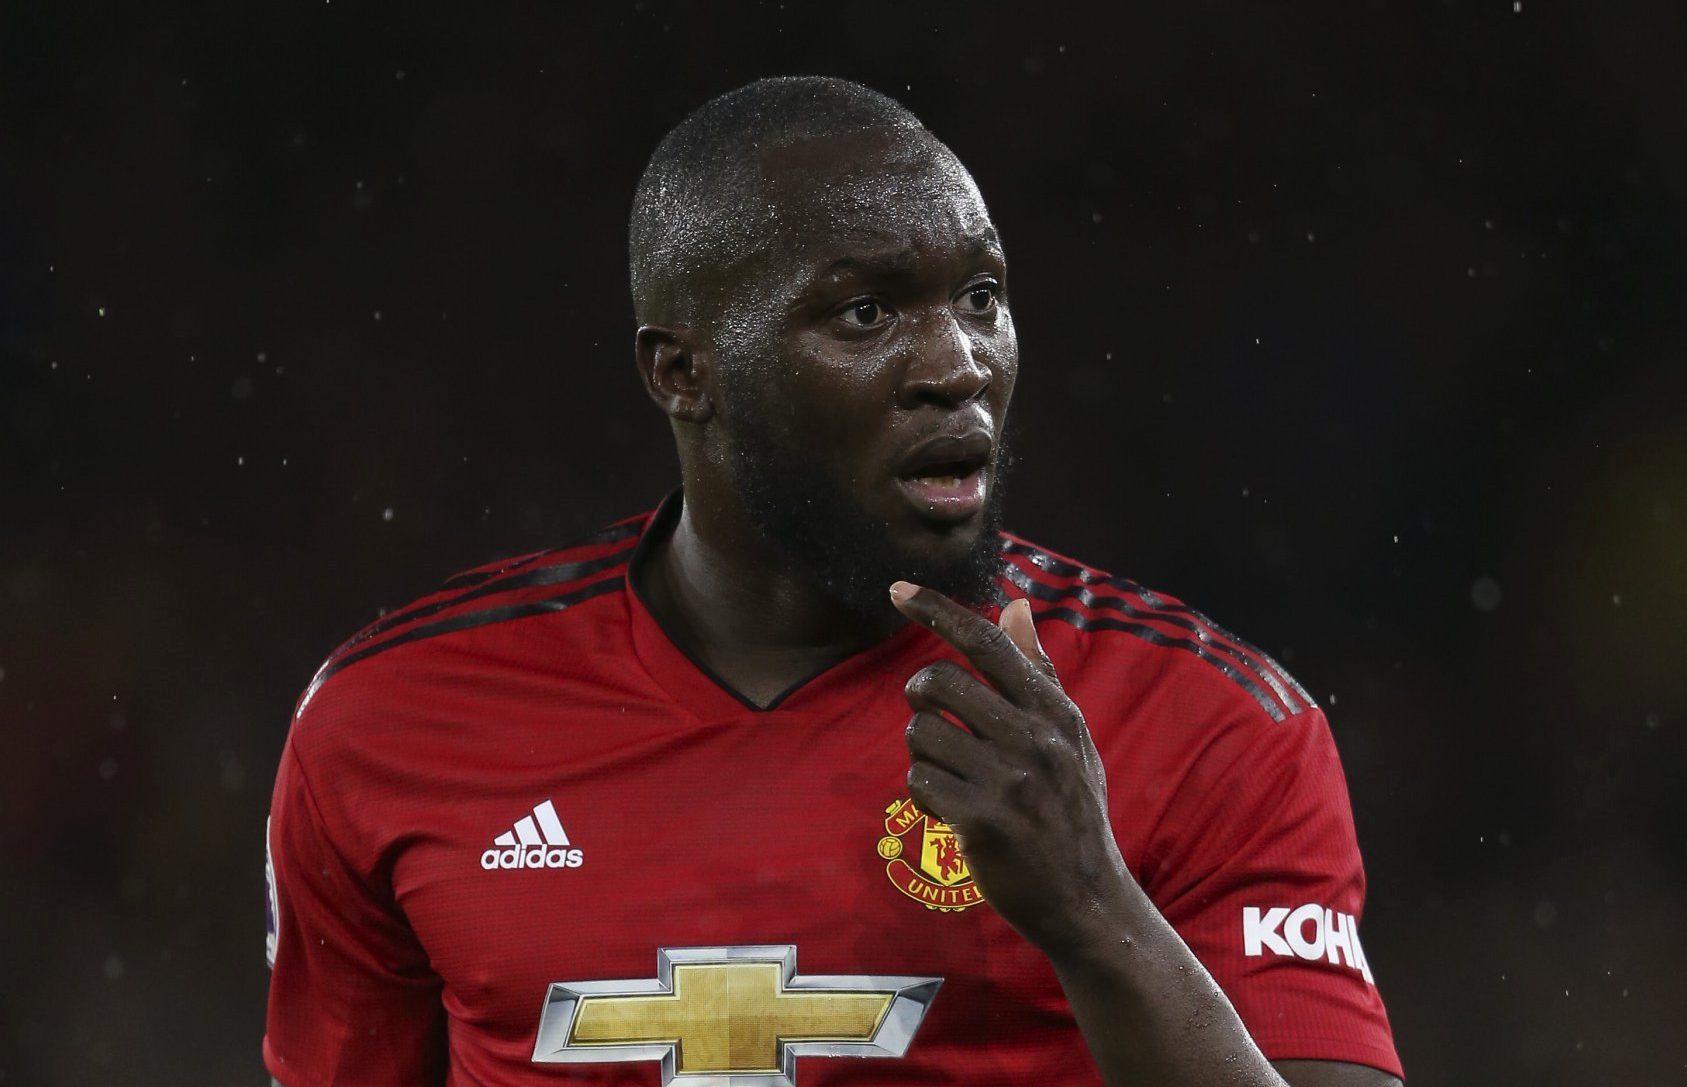 Romelu Lukaku's agent reveals striker is open to leaving Manchester United